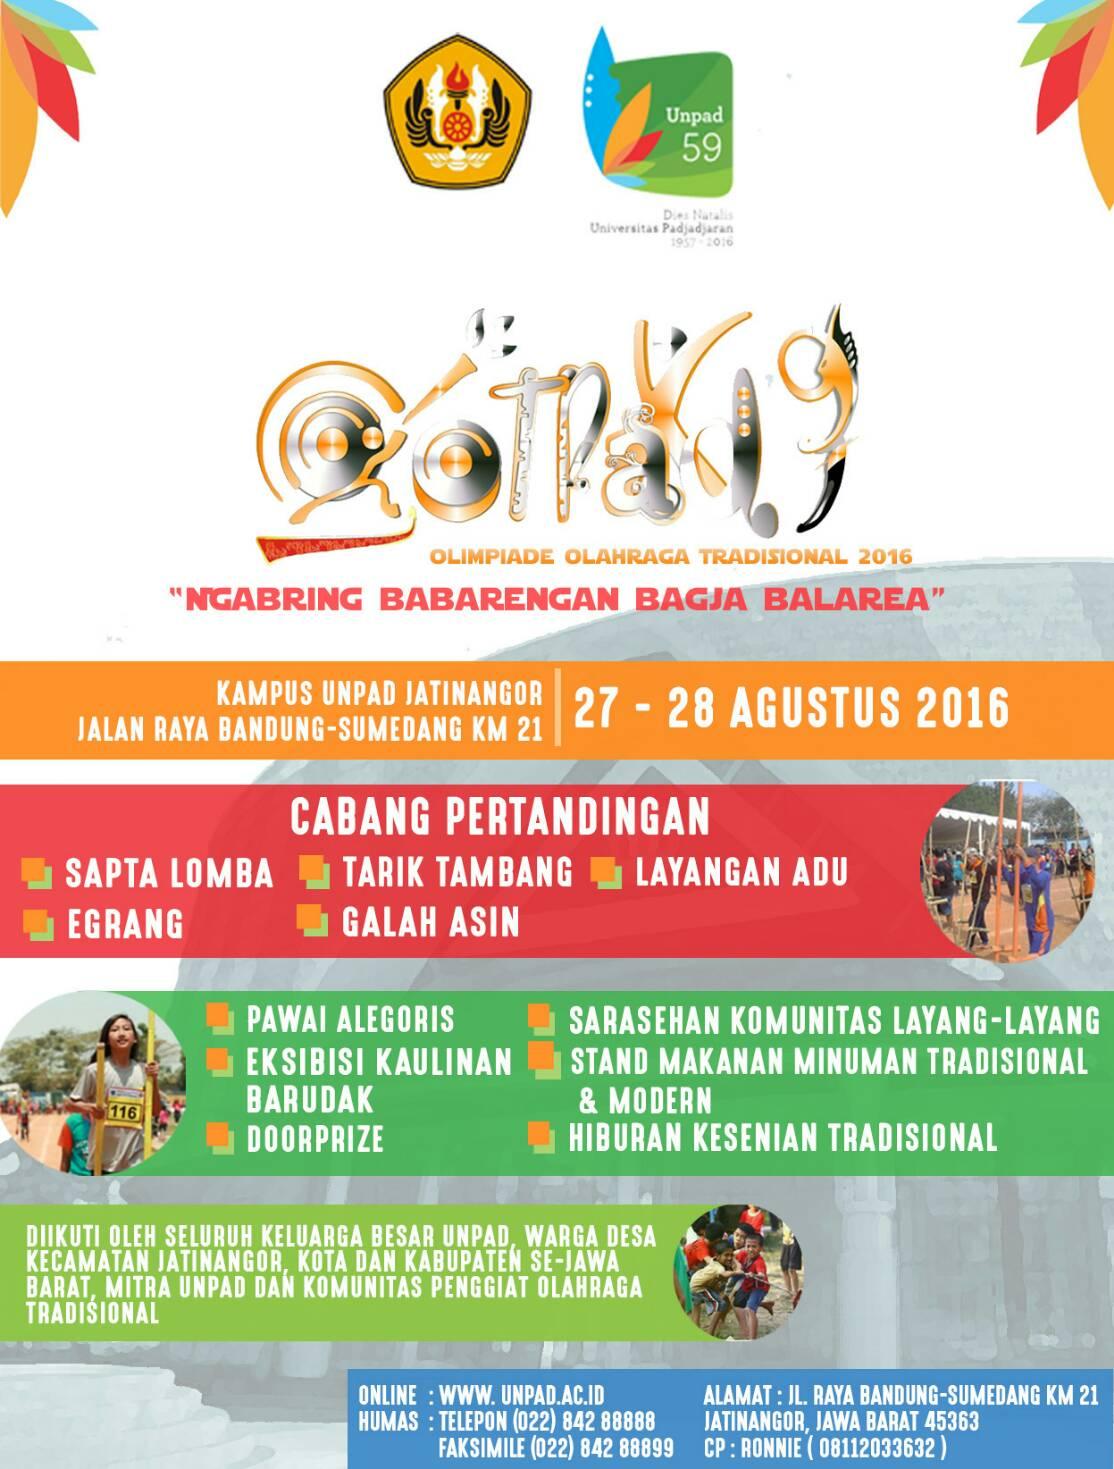 Olimpiade Olah Raga Tradisional (Ootrad) 2016